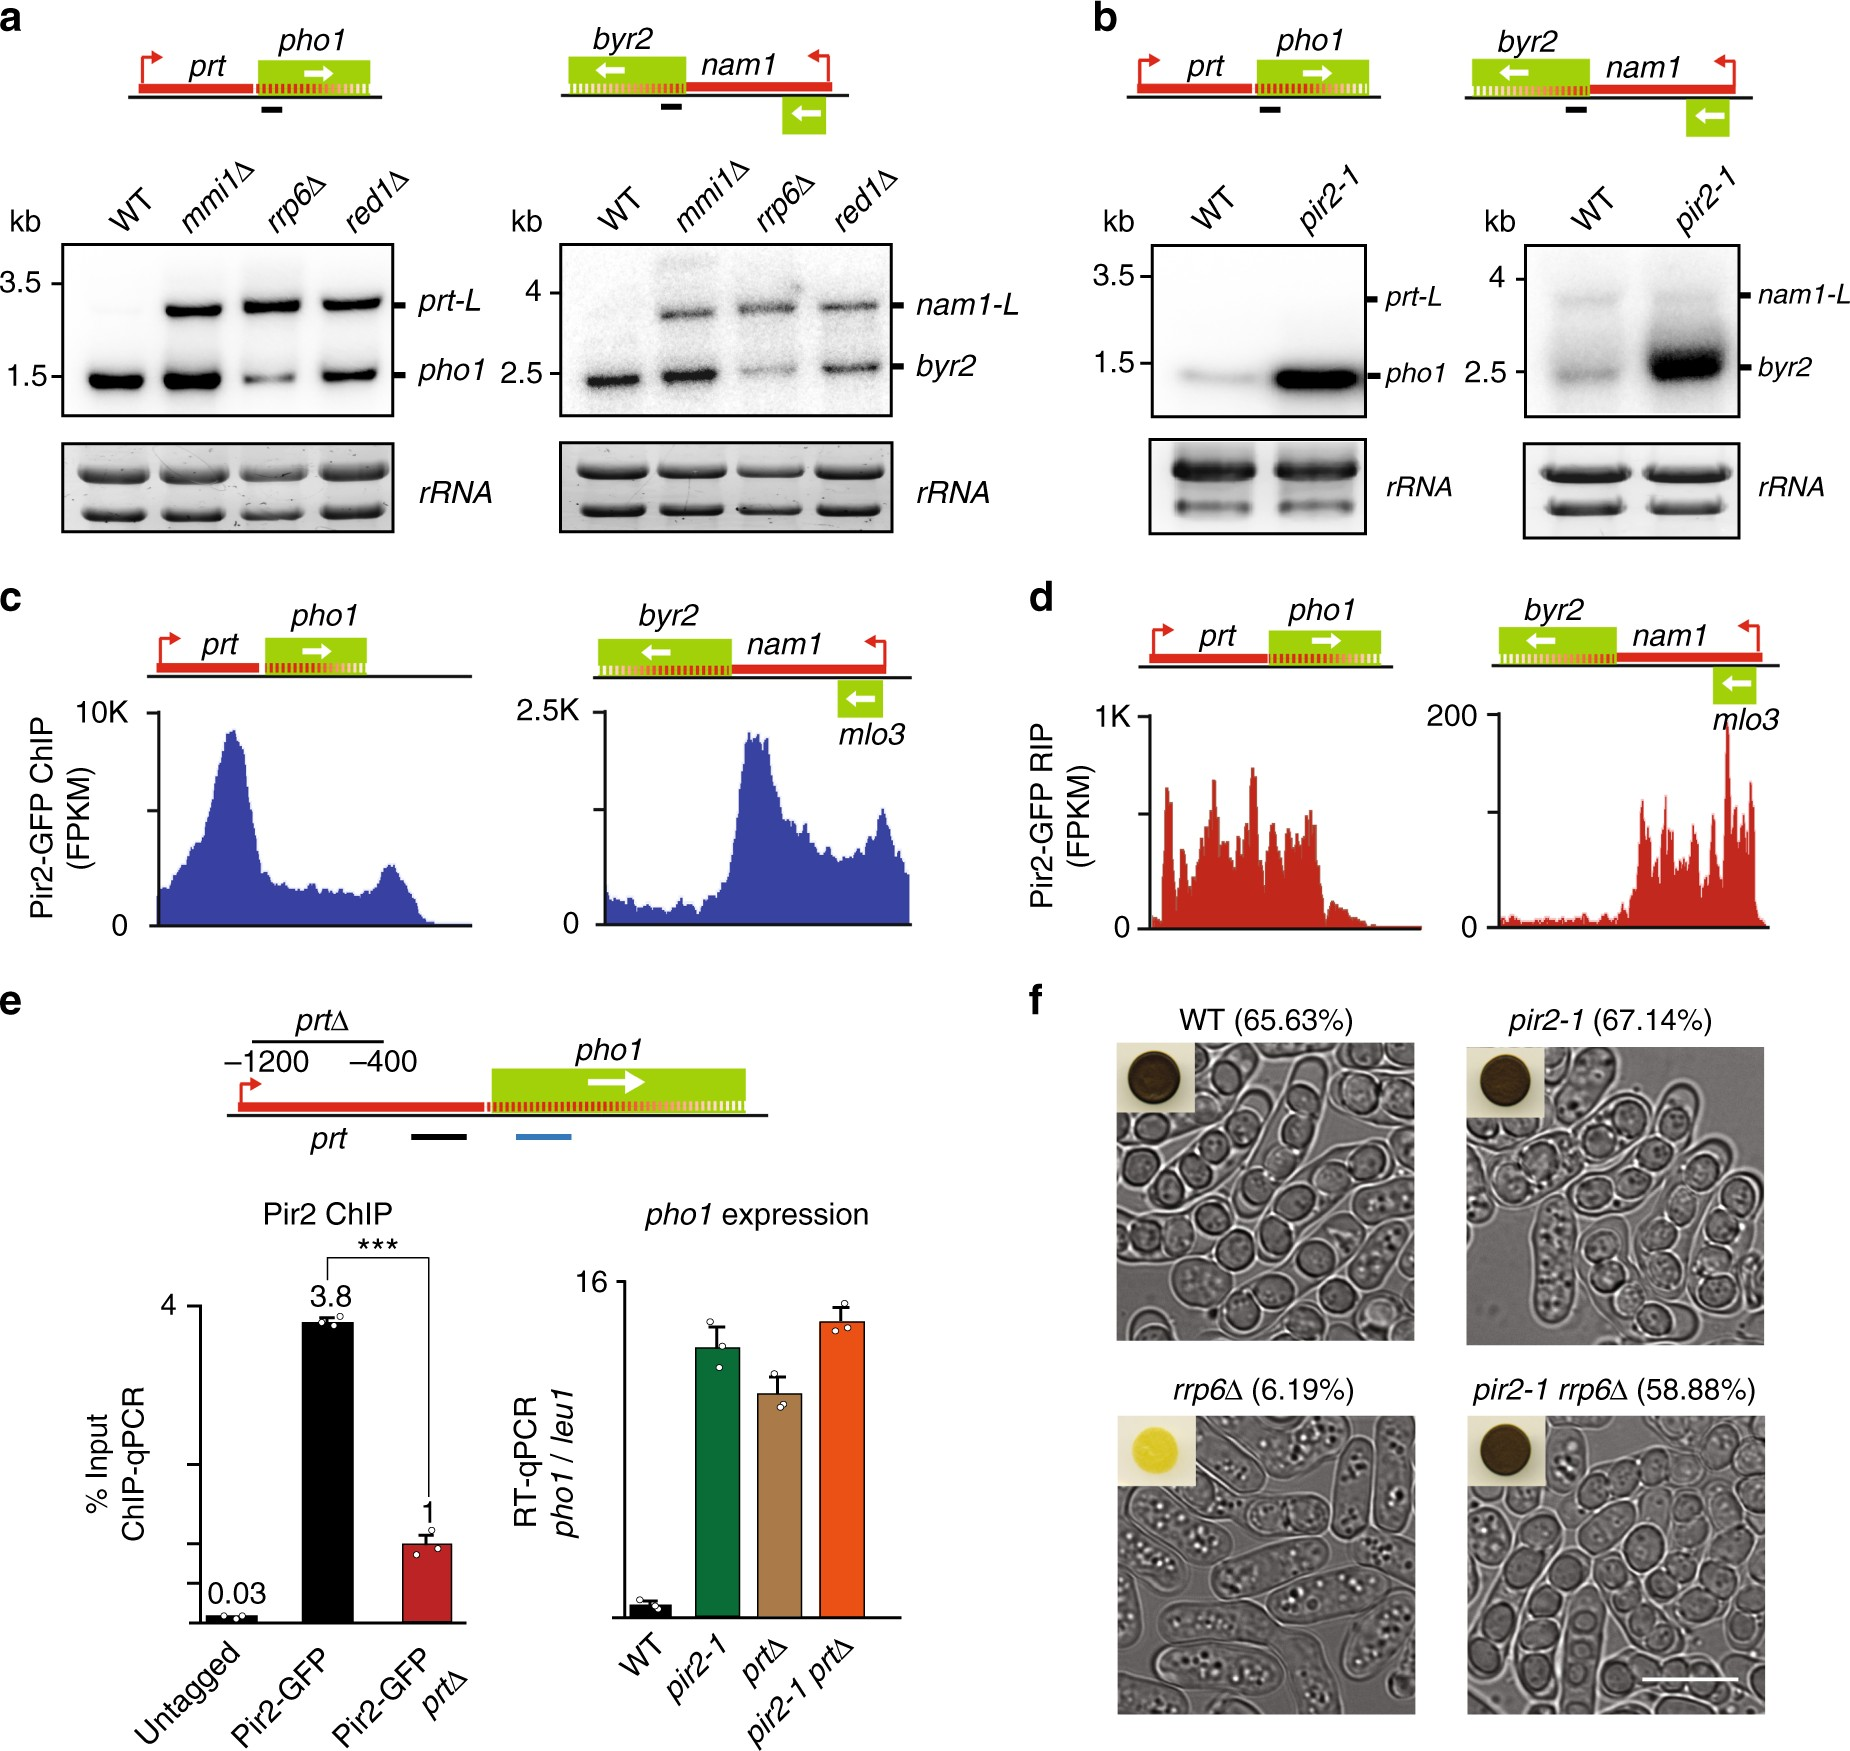 Wireing Diagram for Gbu130 Pellet Conserved Protein Pir2 Ars2 Mediates Gene Repression Through Of Wireing Diagram for Gbu130 Pellet